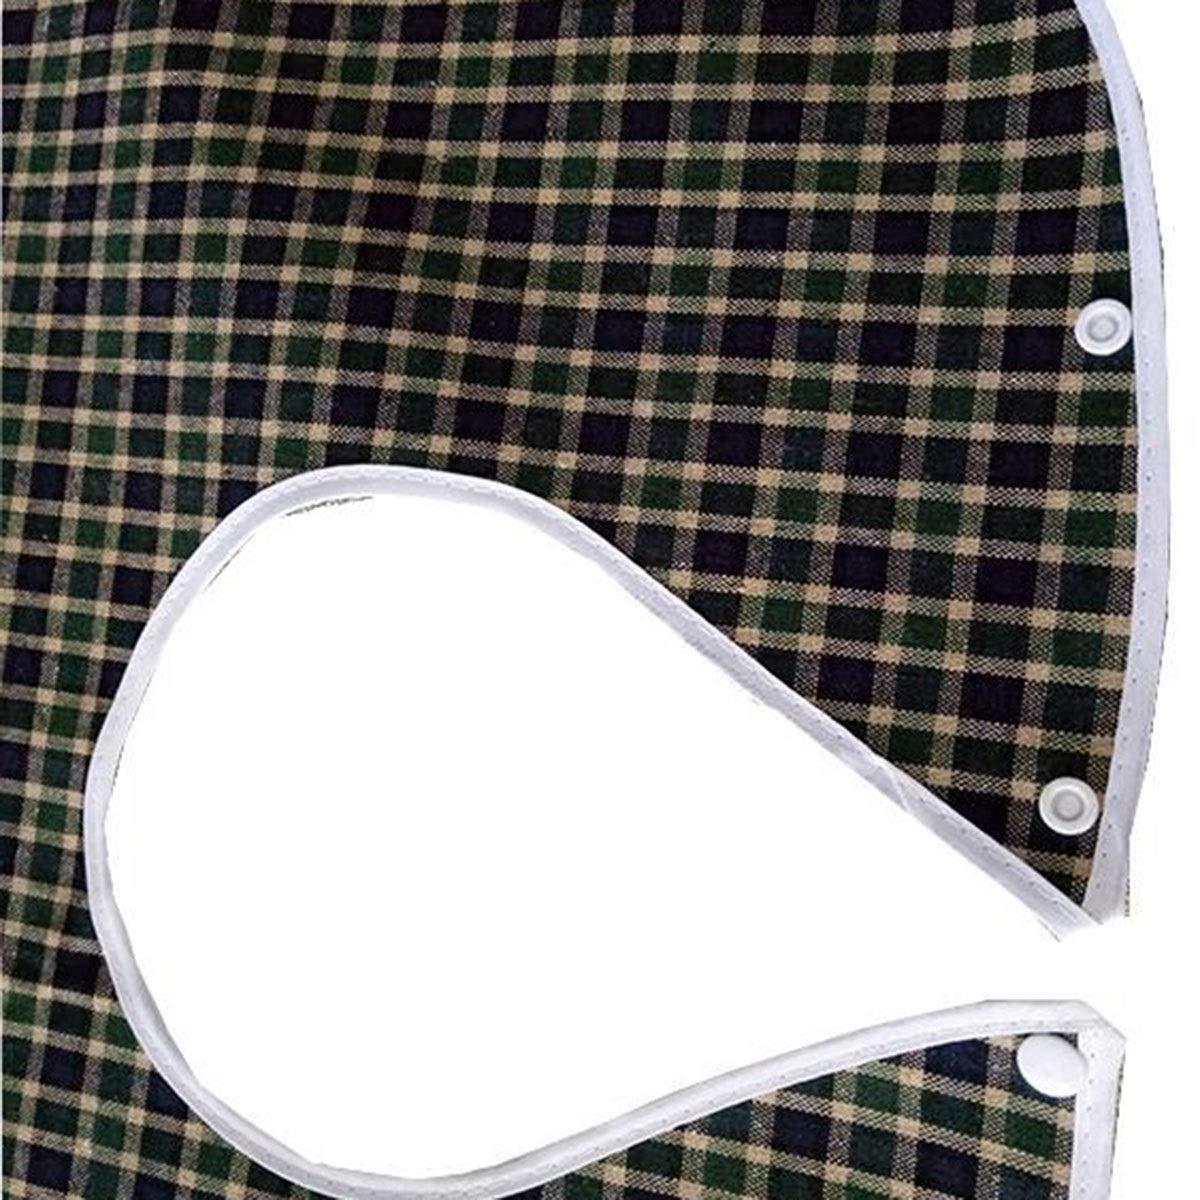 Haokaini Waterproof Adult Bibs, Saliva Towel Aprons Bibs for Elder, Unisex Adult Feeding Drinking Anti-Leak Clothes Clothing Protector (Color : Green)